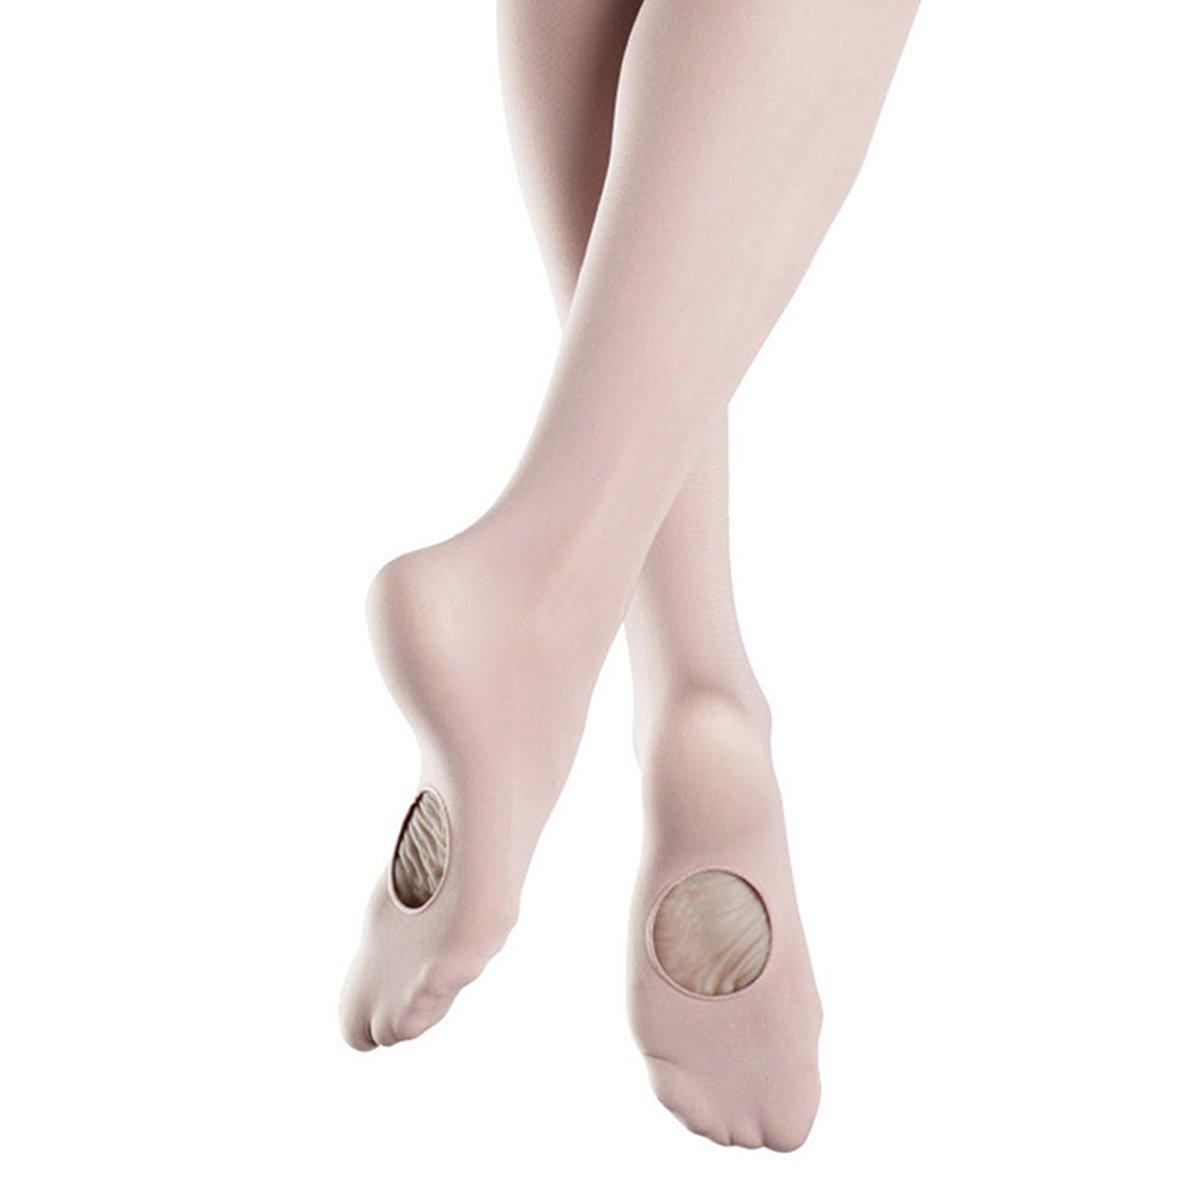 Pitping Girls Dance Convertible Transition Ballet Tights Stockings Socks